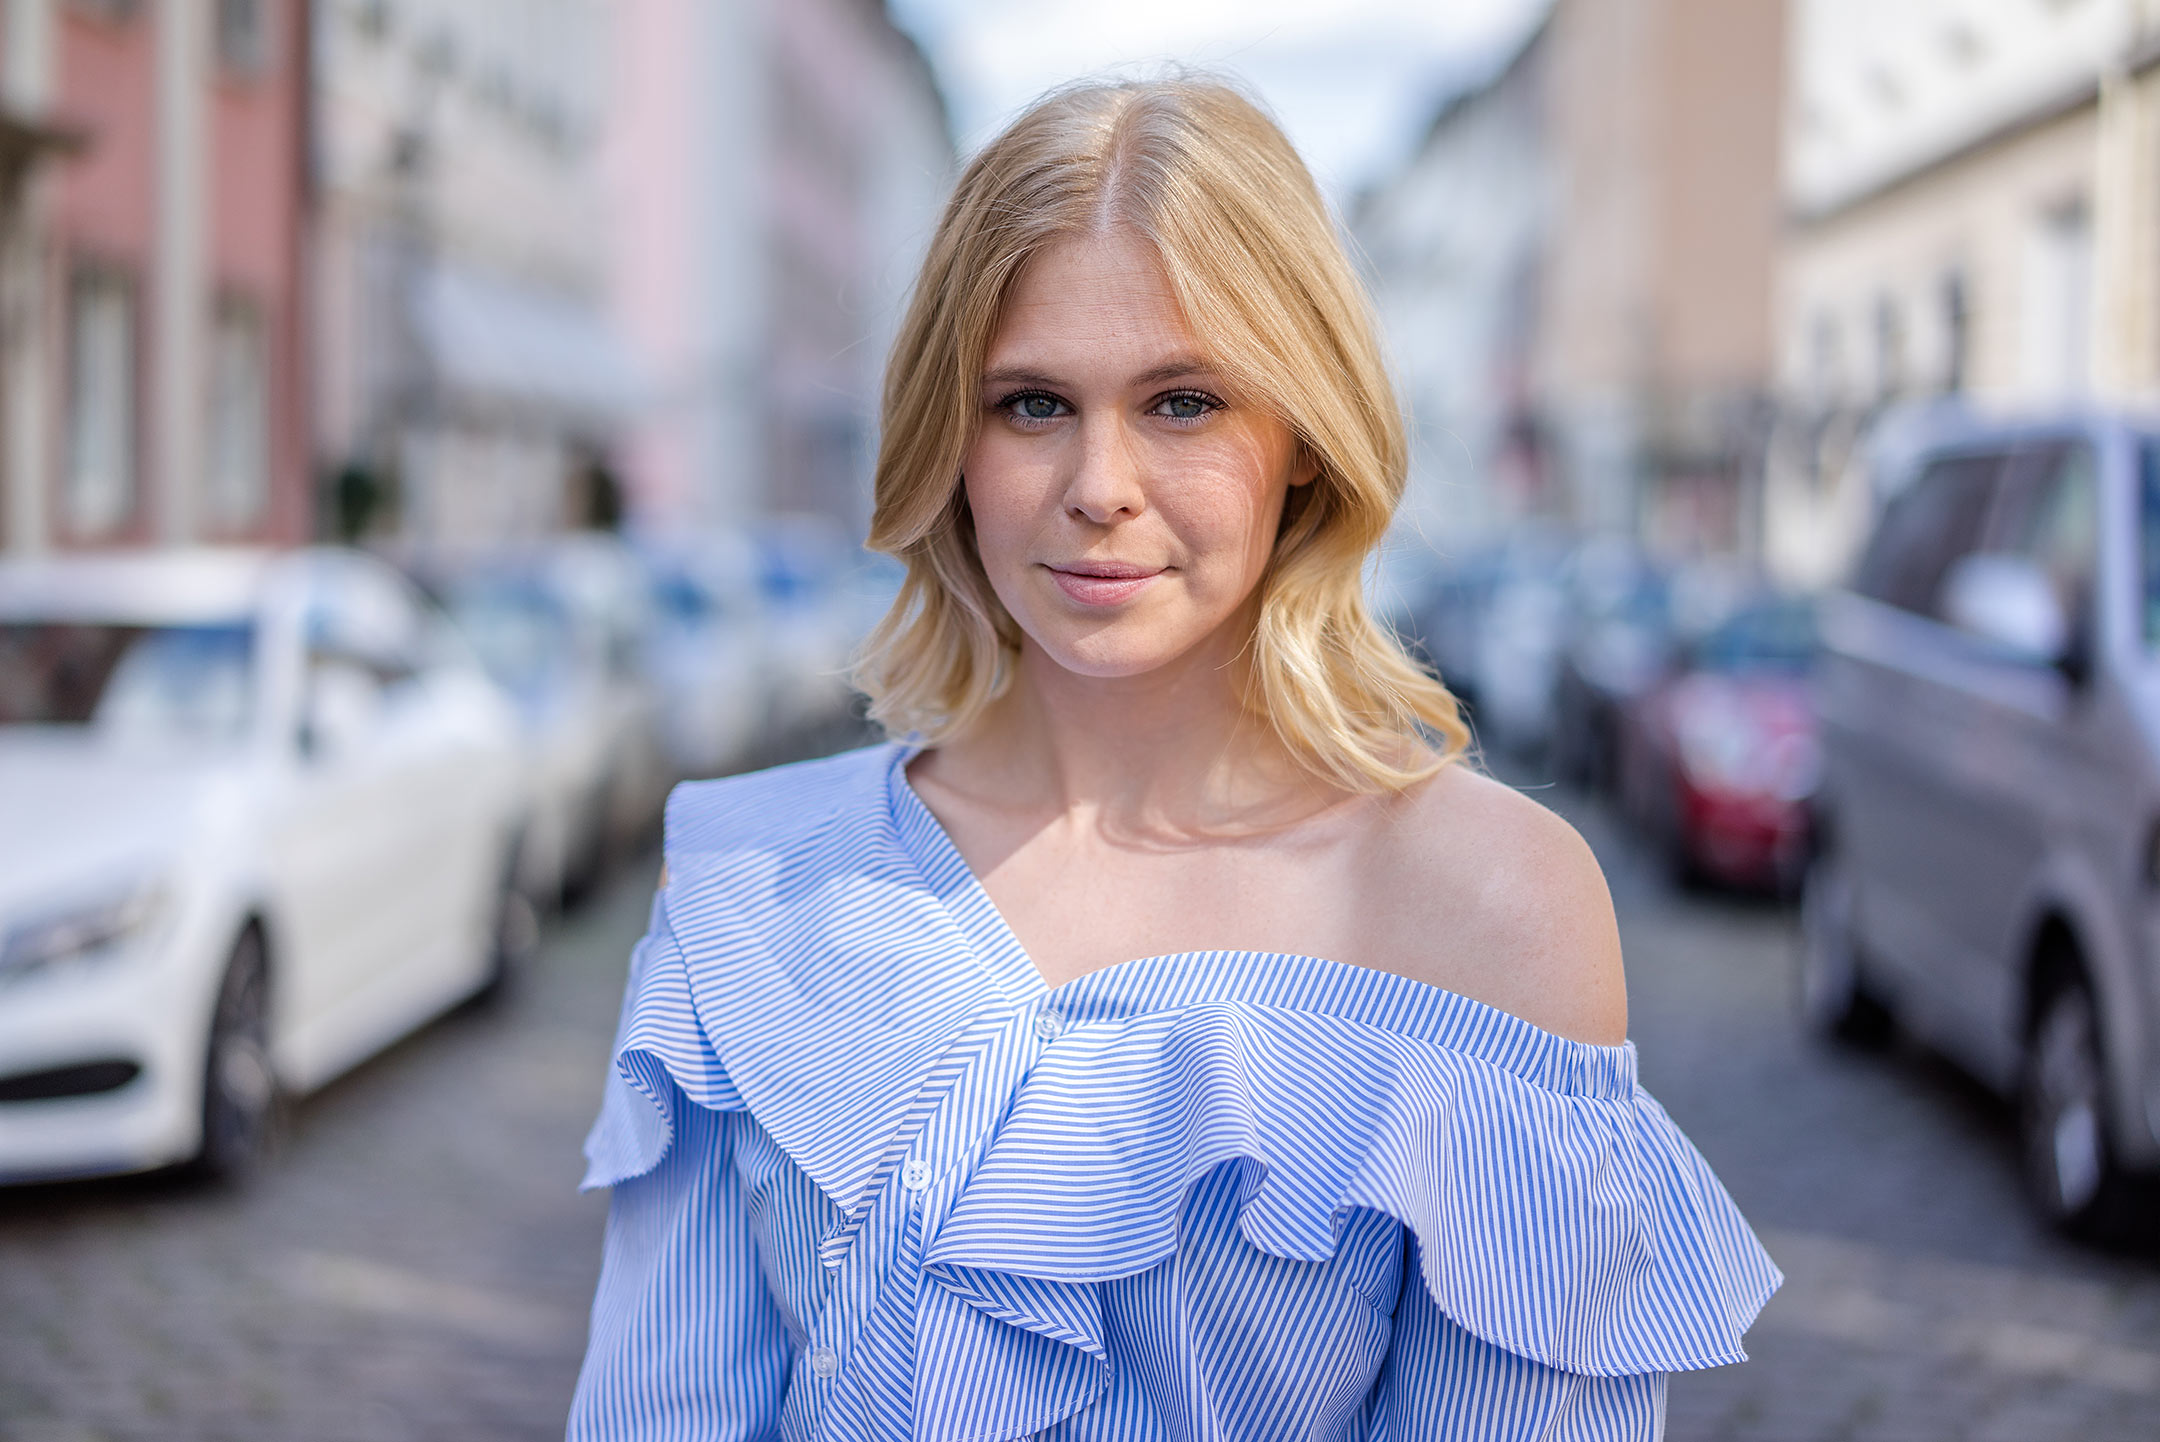 Sunnyinga schräg geknöpfte Bluse blau weiss Mode Outfit